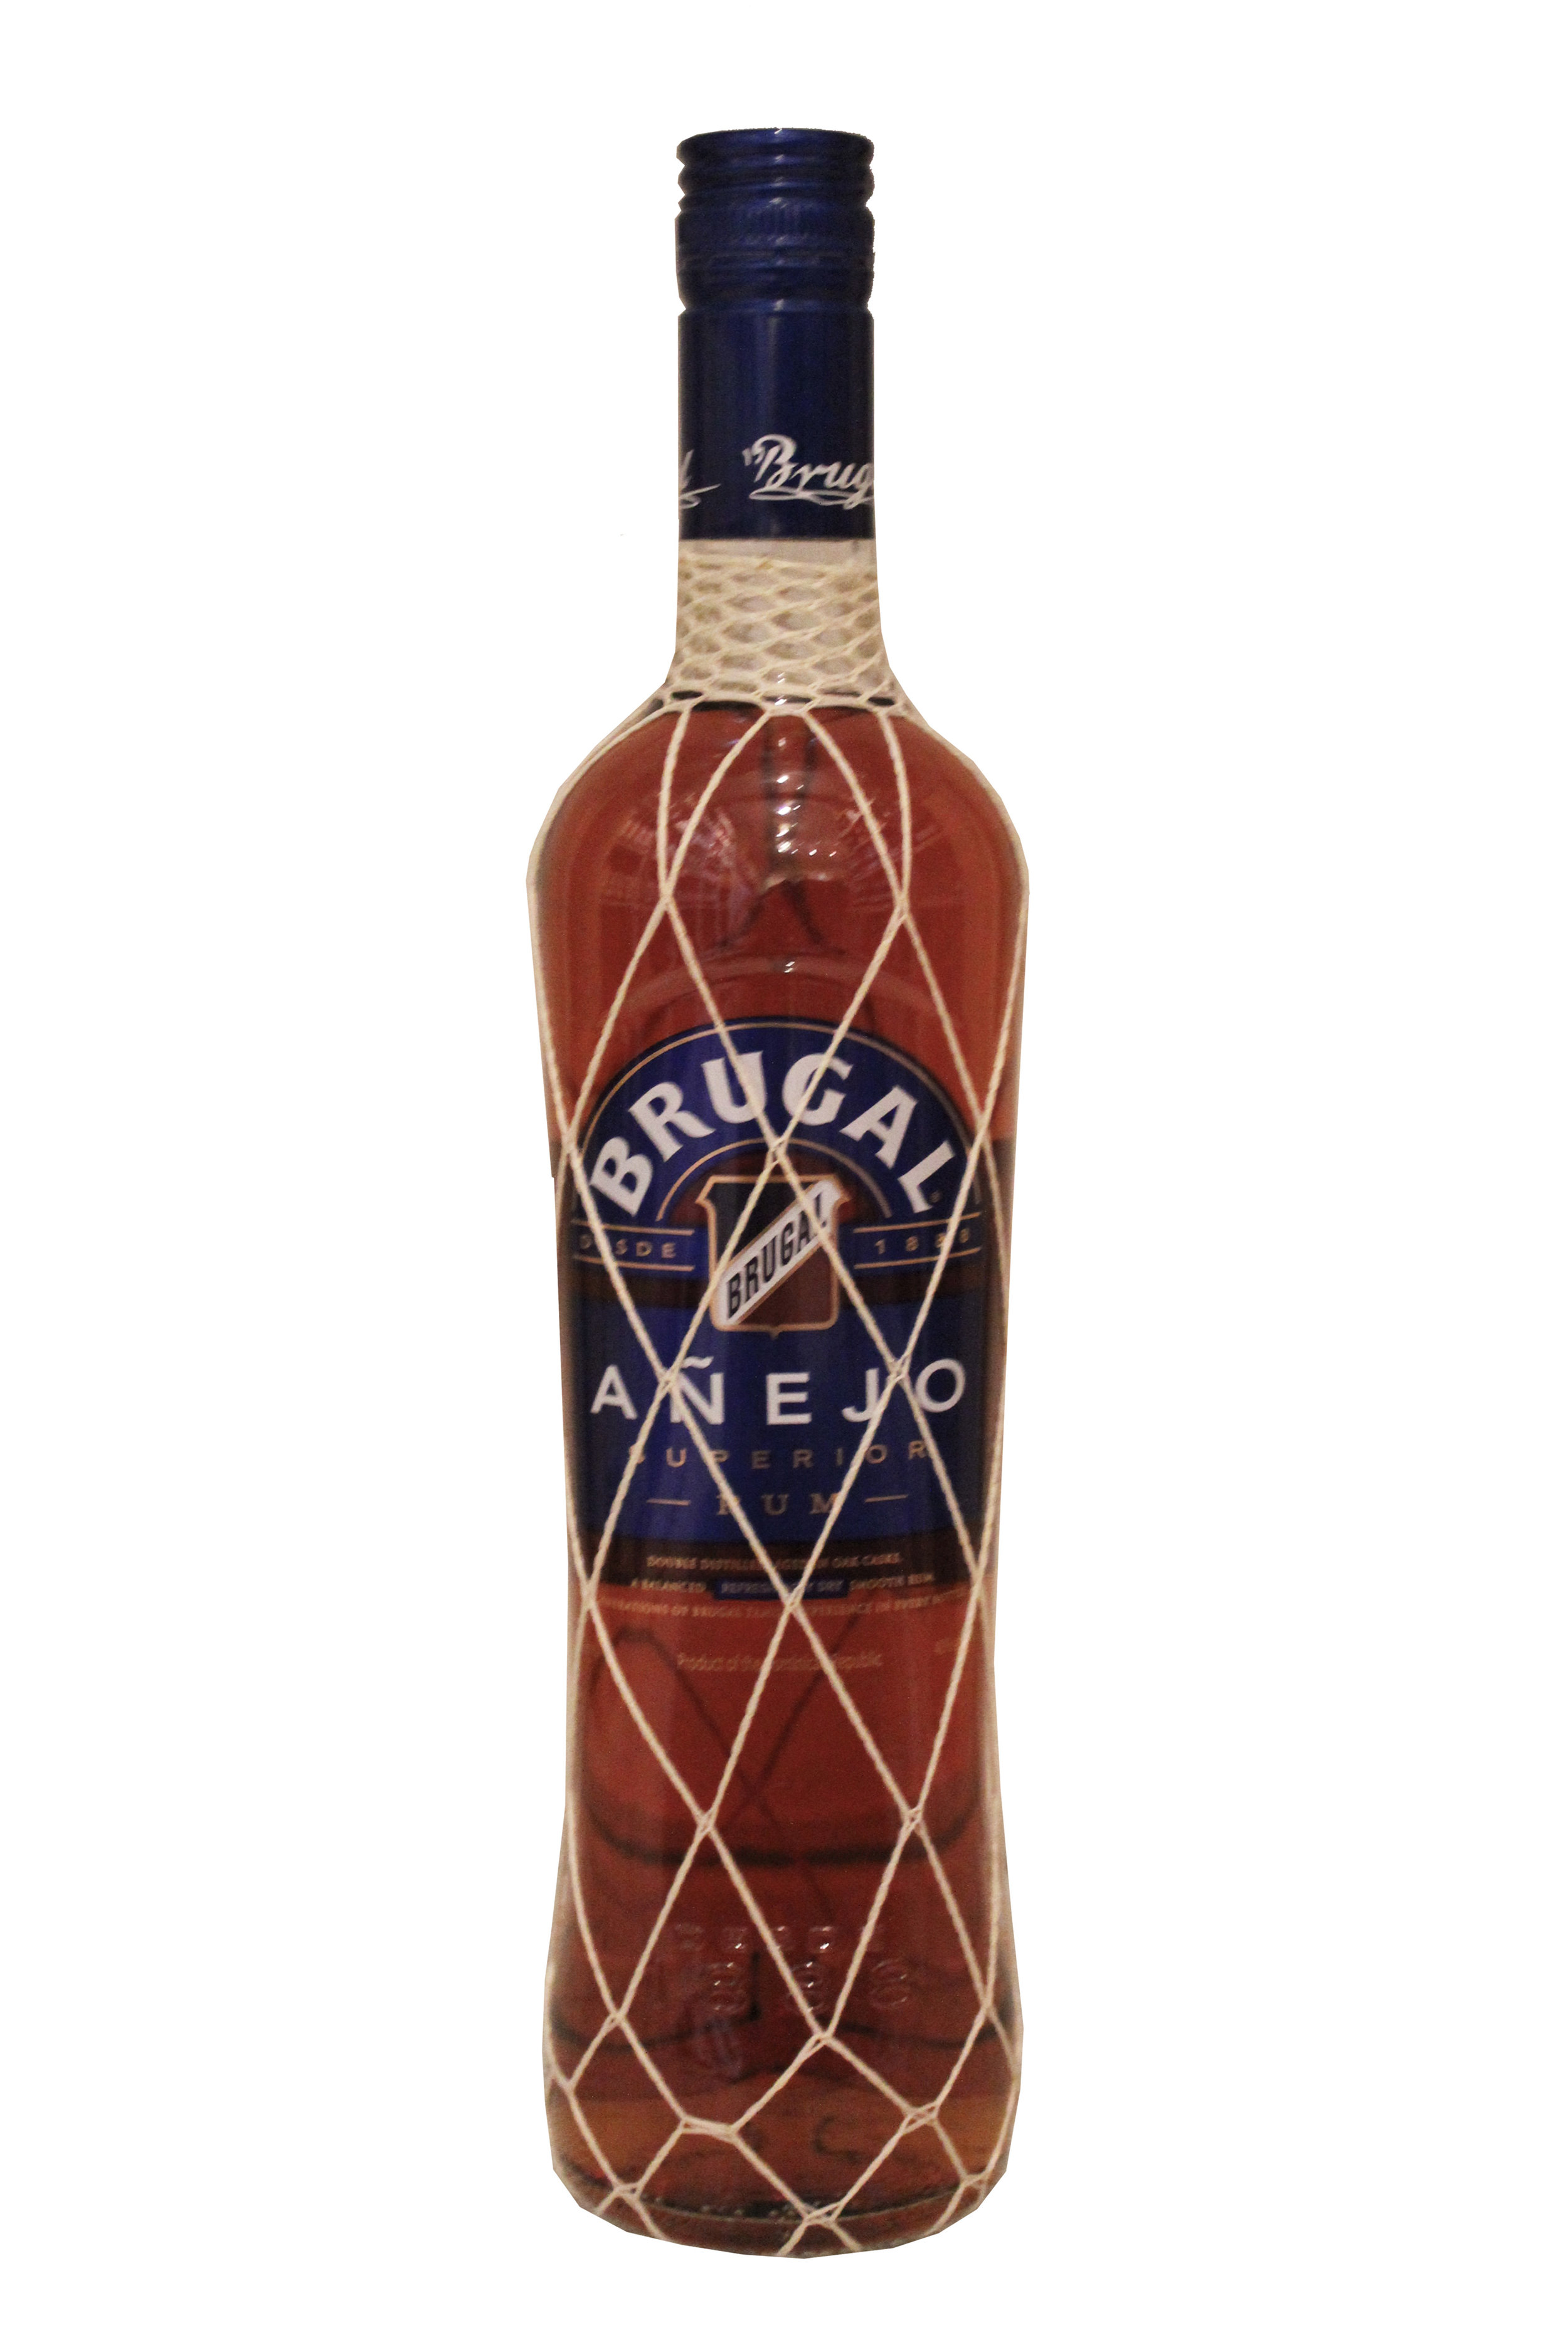 Barrel Aged Rum  Brugal Anejo, Dominican Republic